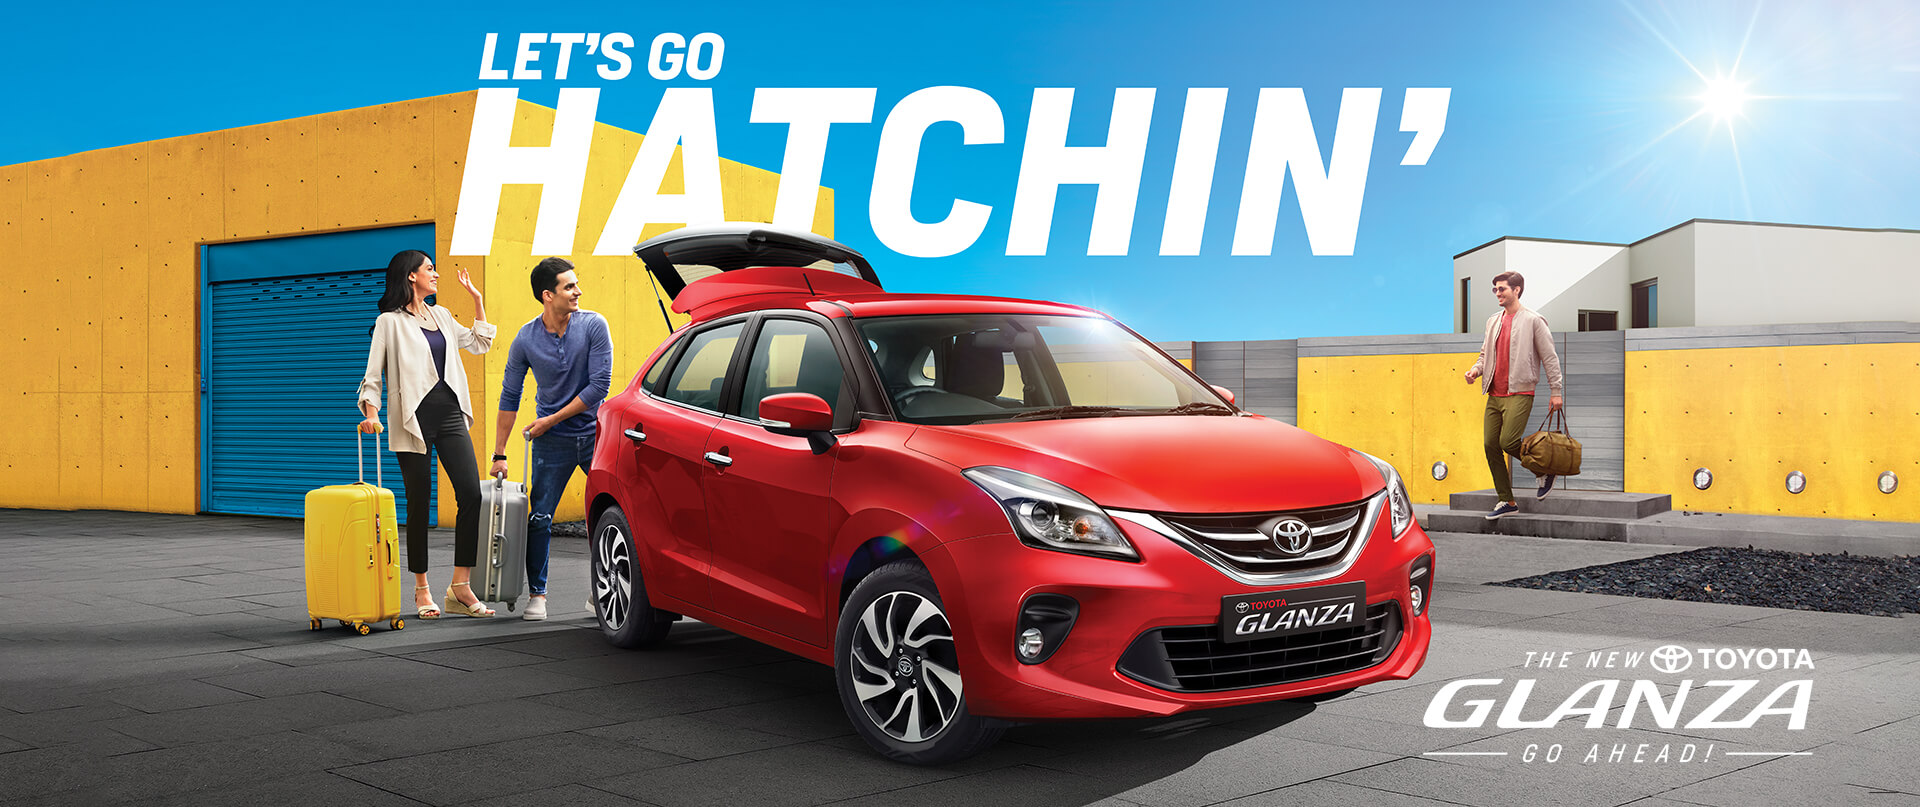 Toyota Glanza Meluncur, Bertaruh dari Hasil Jiplakan Suzuki Baleno